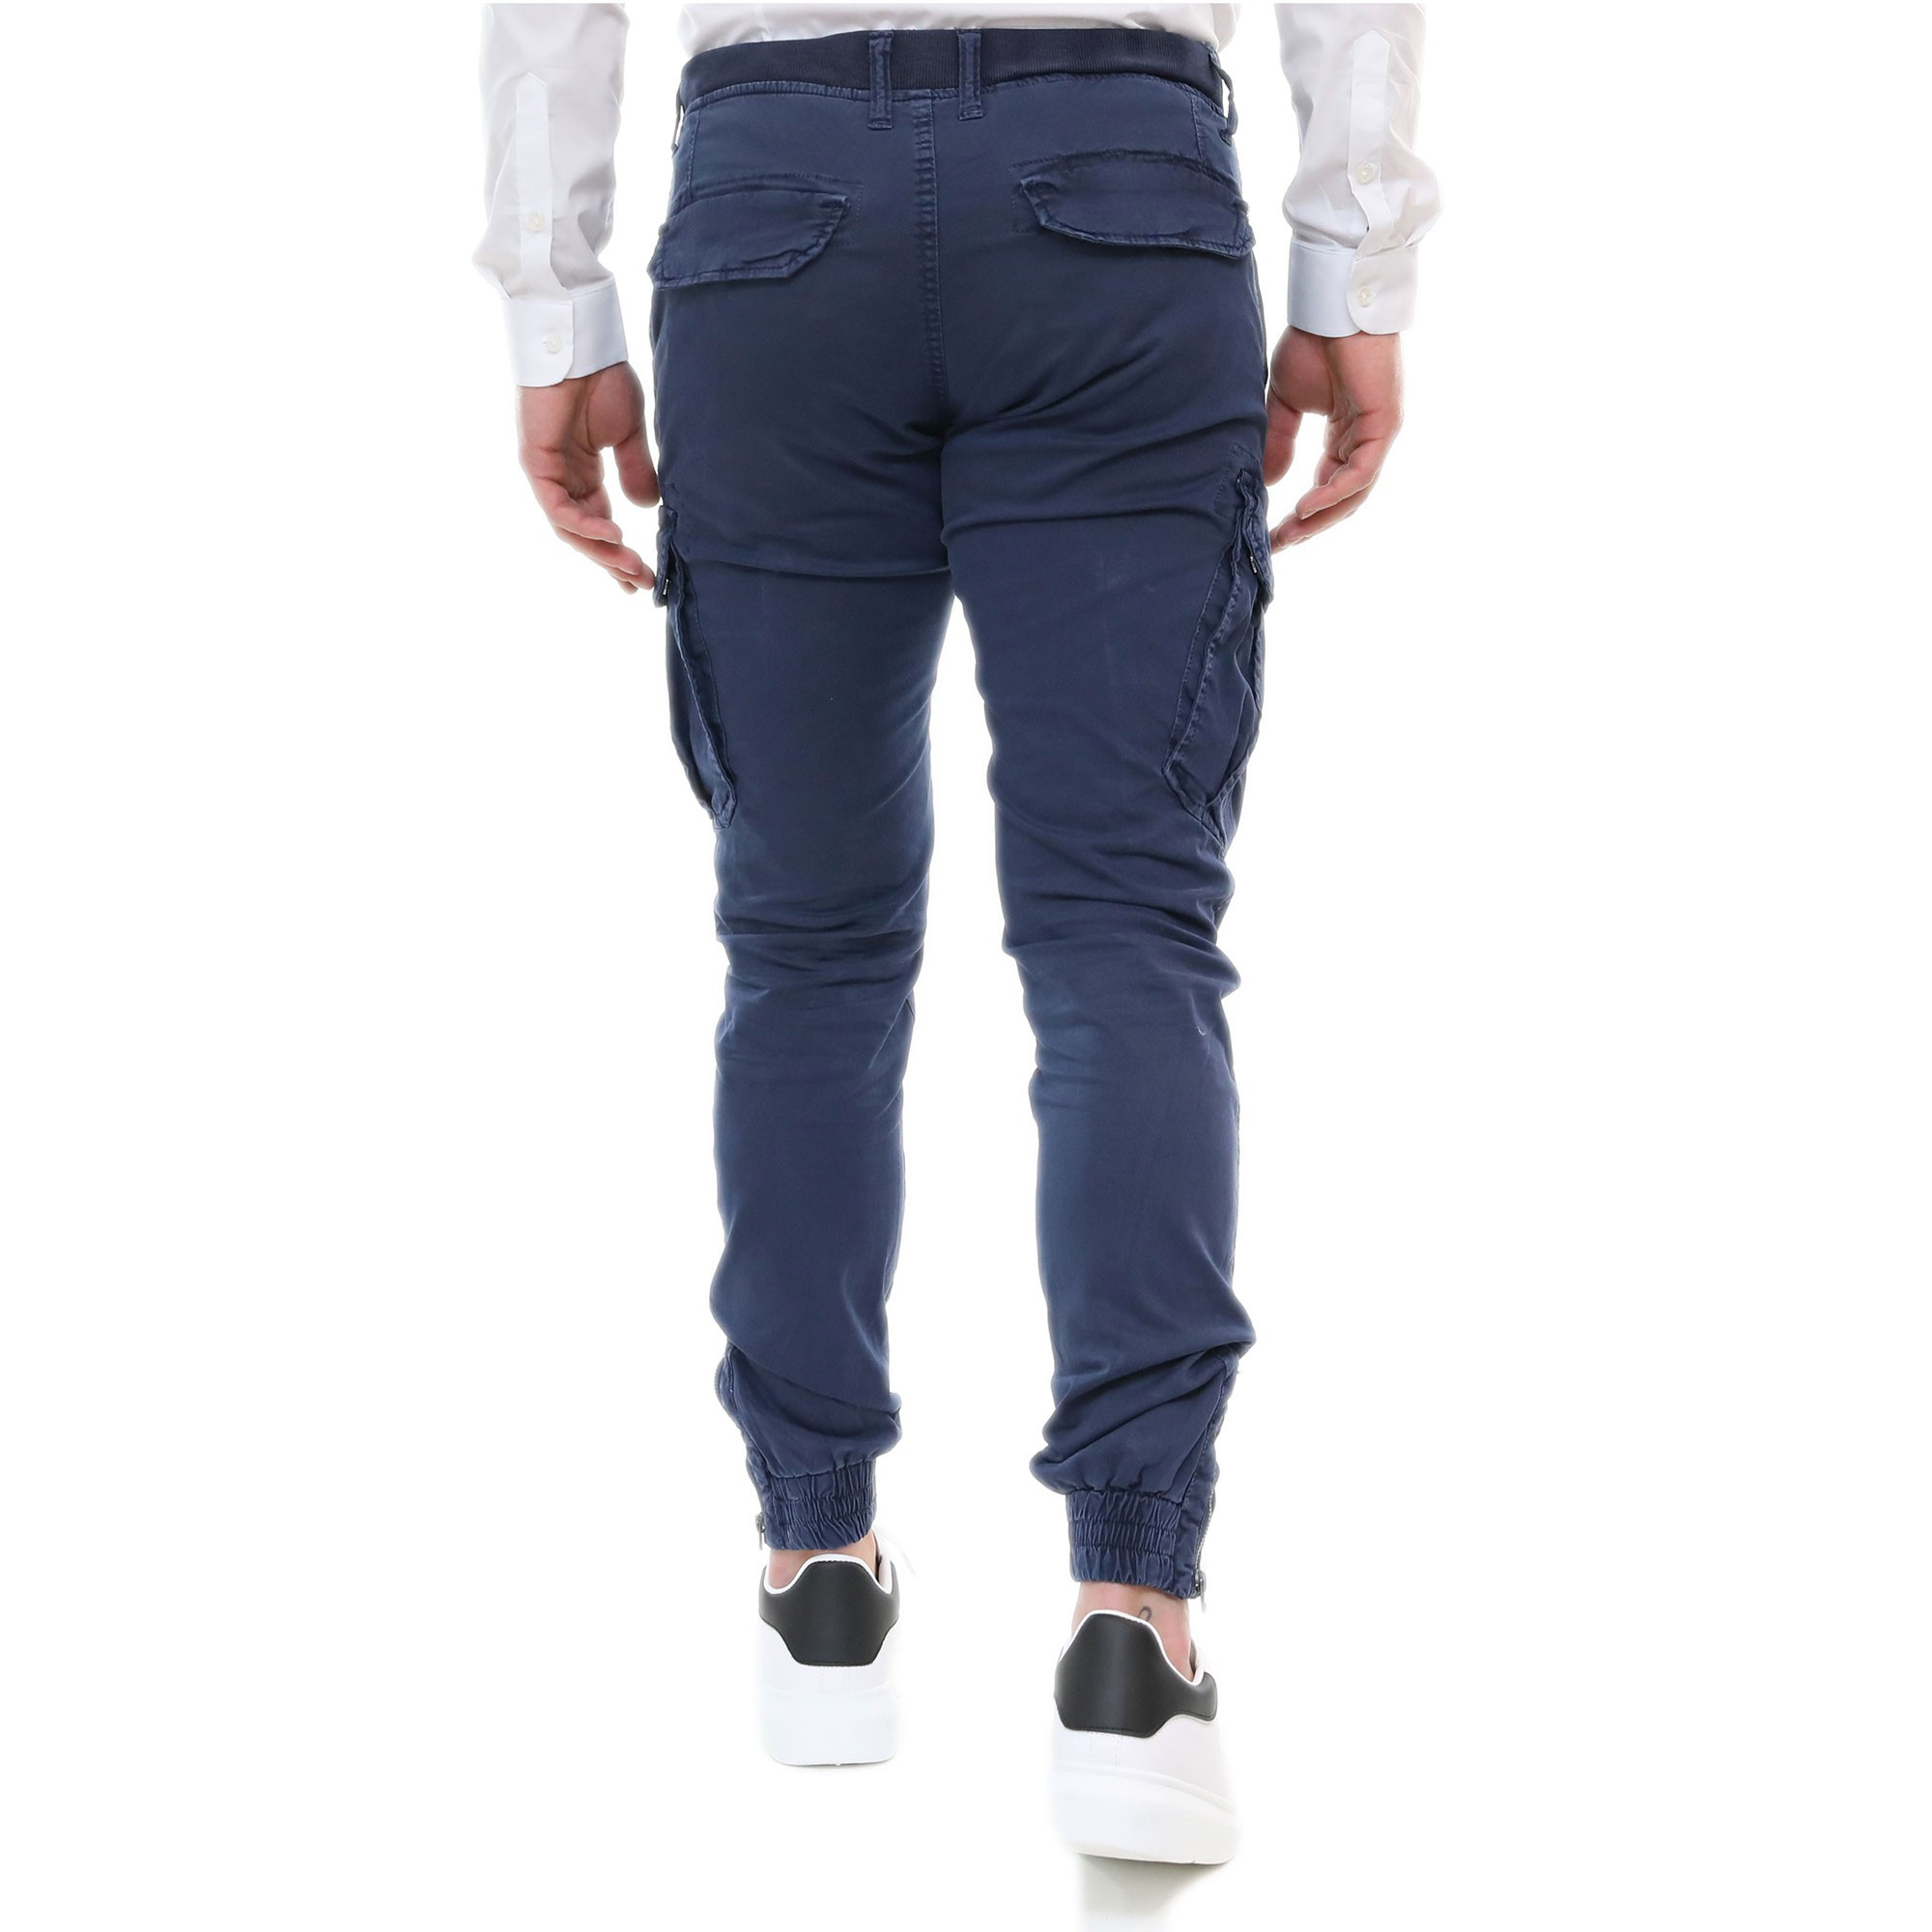 Pantalone-Uomo-Cargo-Primaverile-Con-Tasconi-Verde-Blu-Beige-SlimFit-Pantaloni miniatura 4